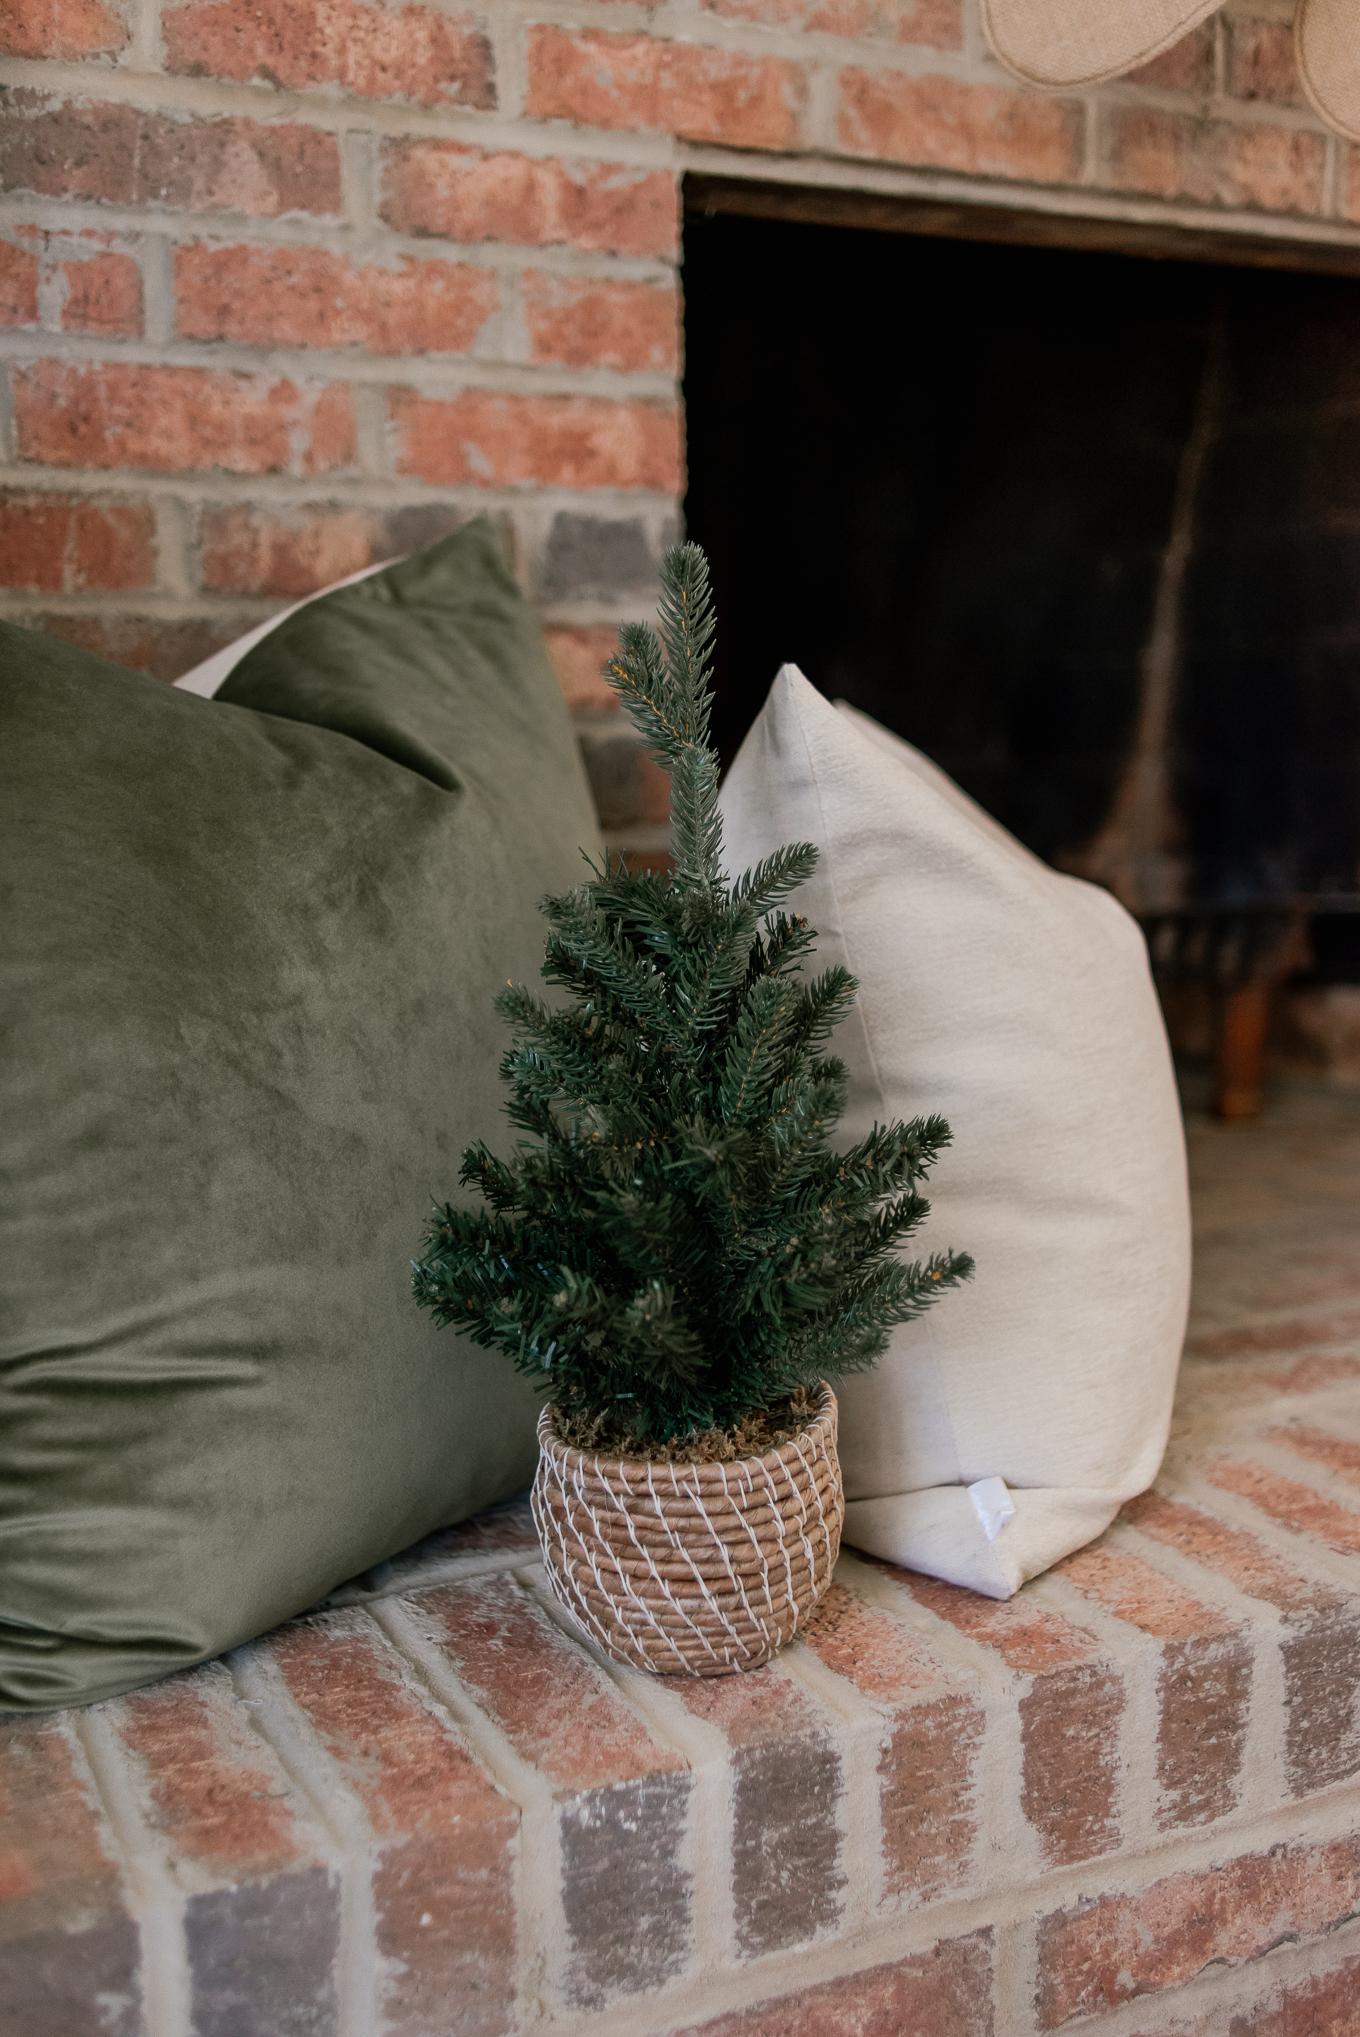 Cozy Christmas Decor | Fireplace Christmas Decor | Louella Reese